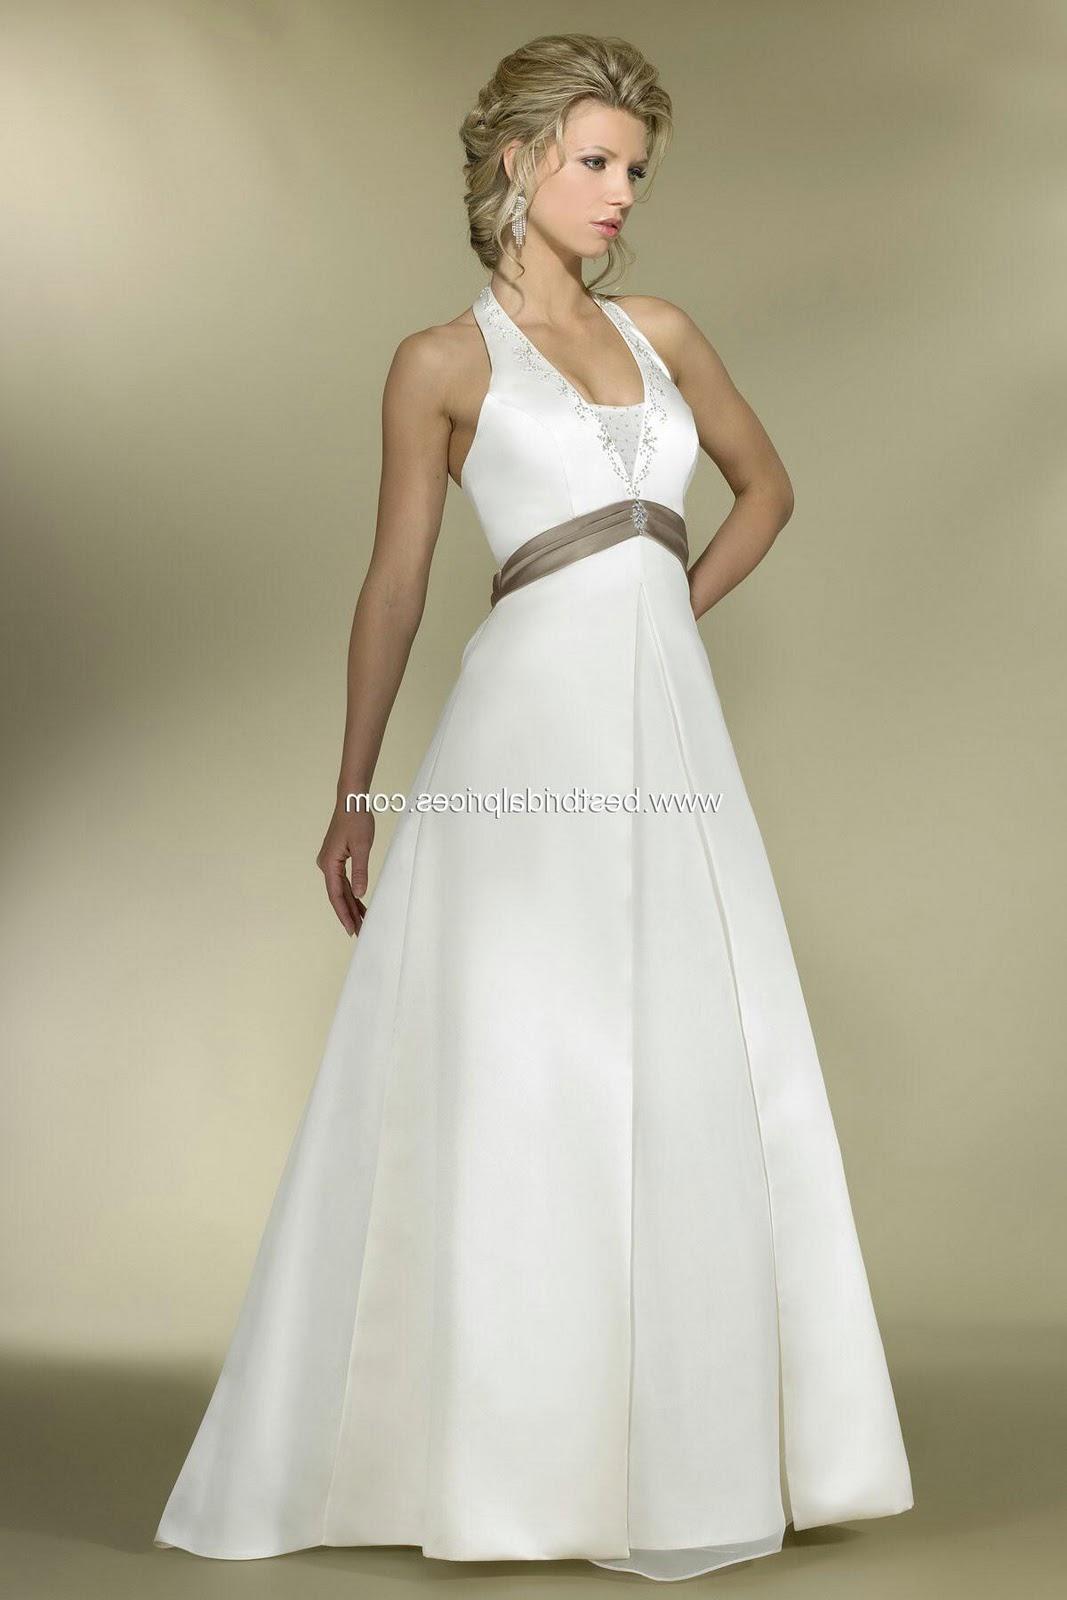 Alexia Informal Wedding Dresses - Style IB11  IB11  -  204.00 : Wedding